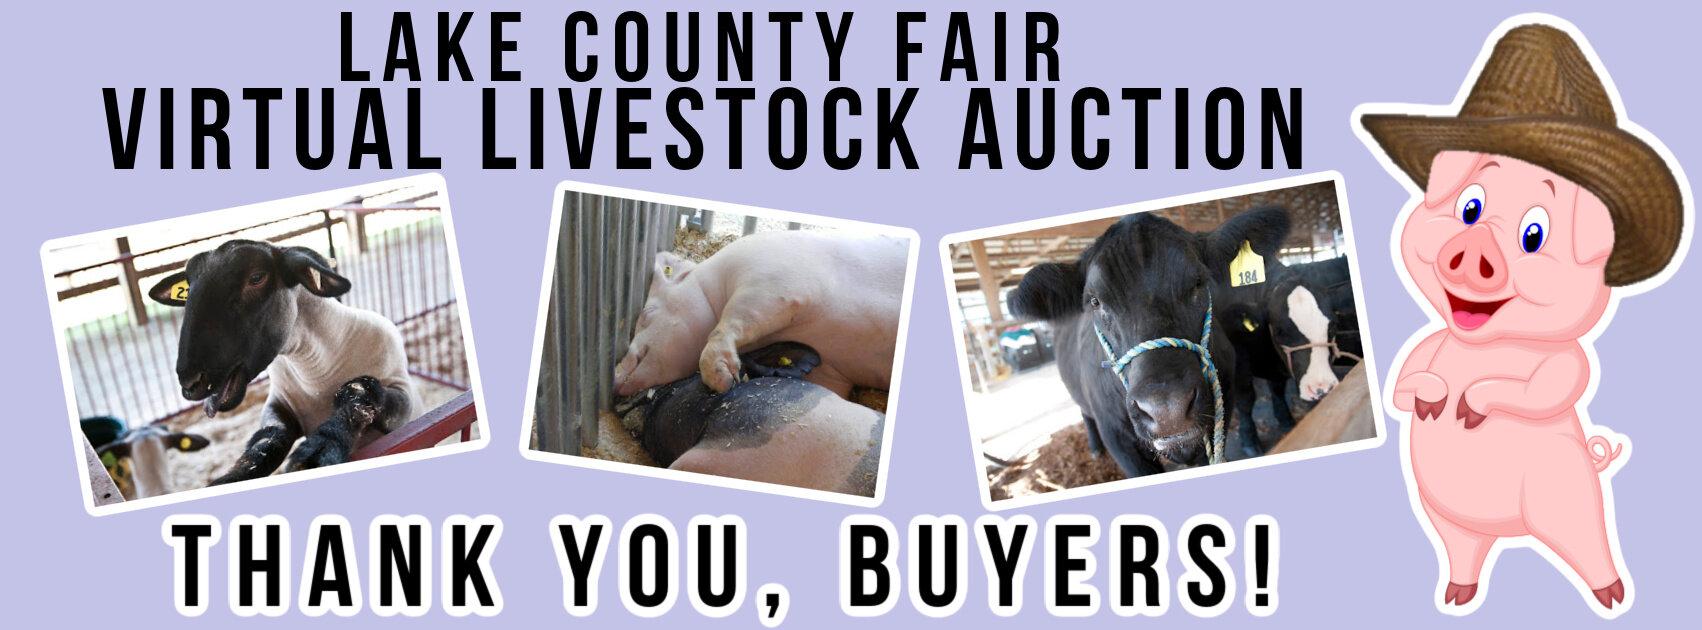 Virtual Livestock Auction Lake County Fair Grayslake Il